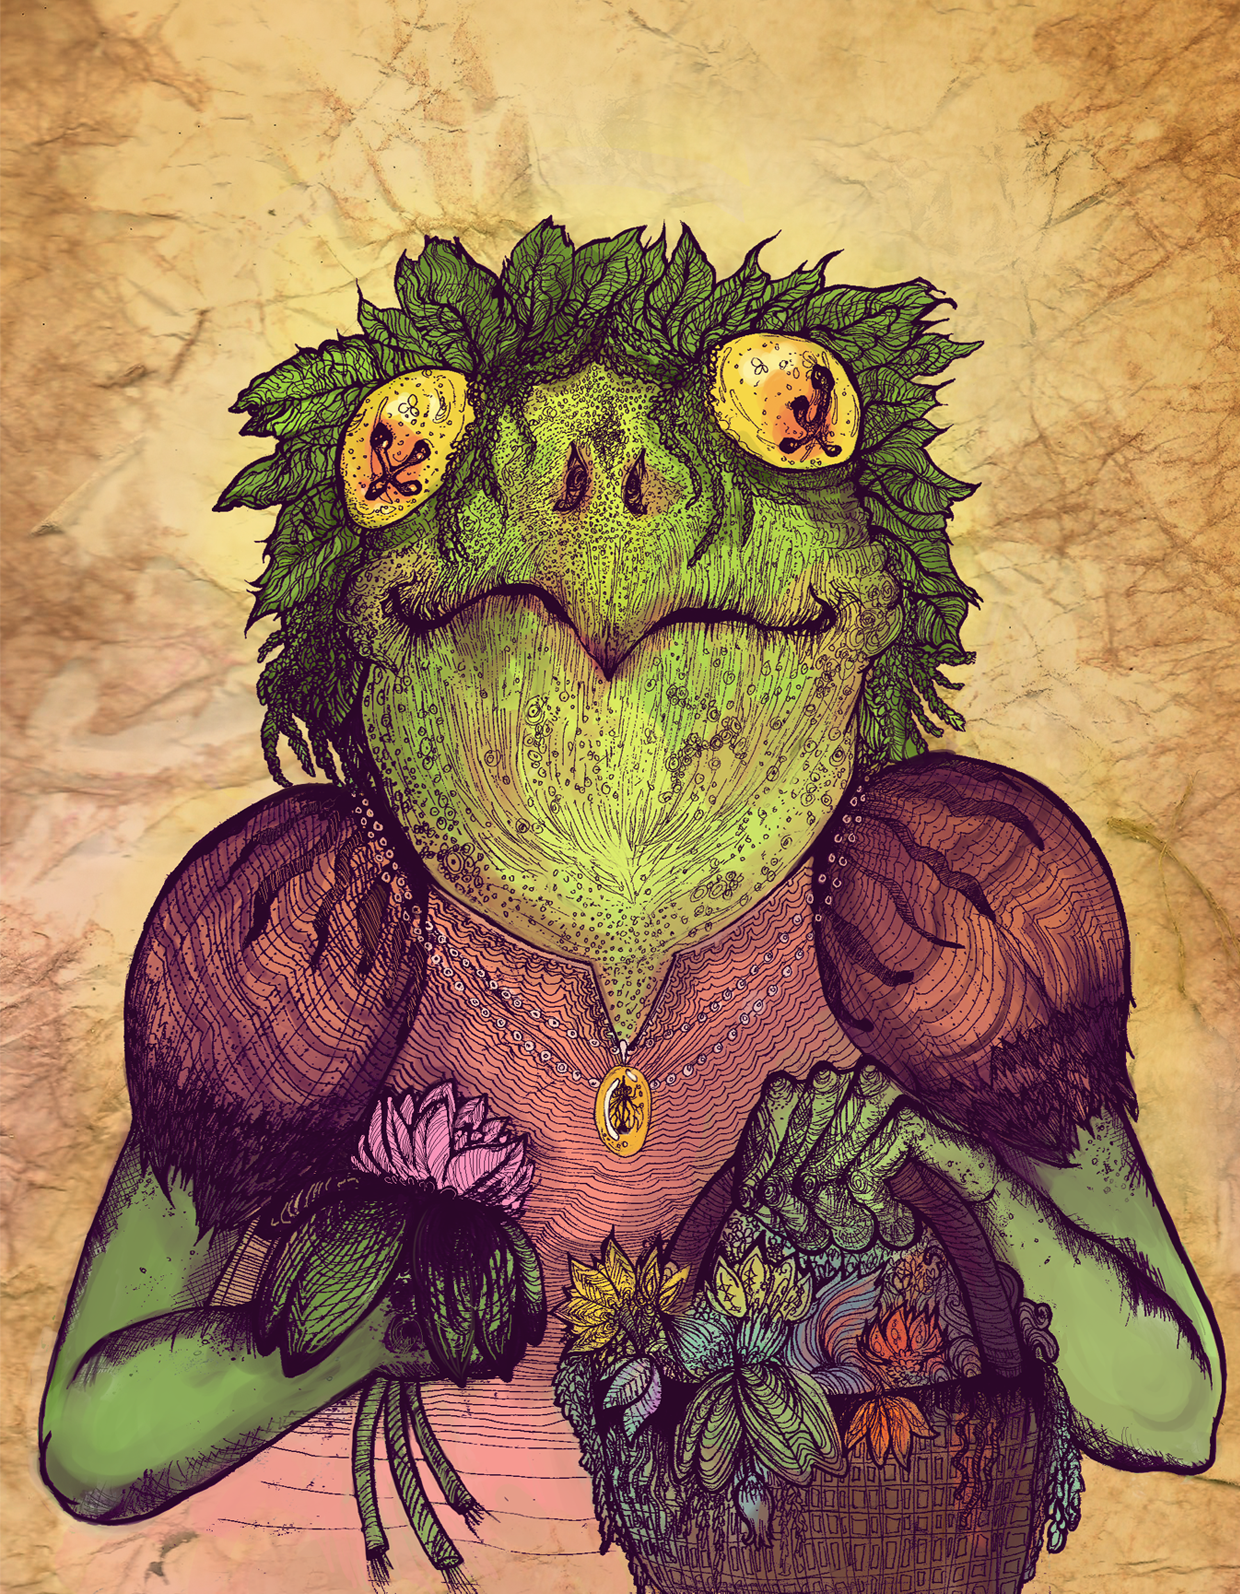 Swampmaiden